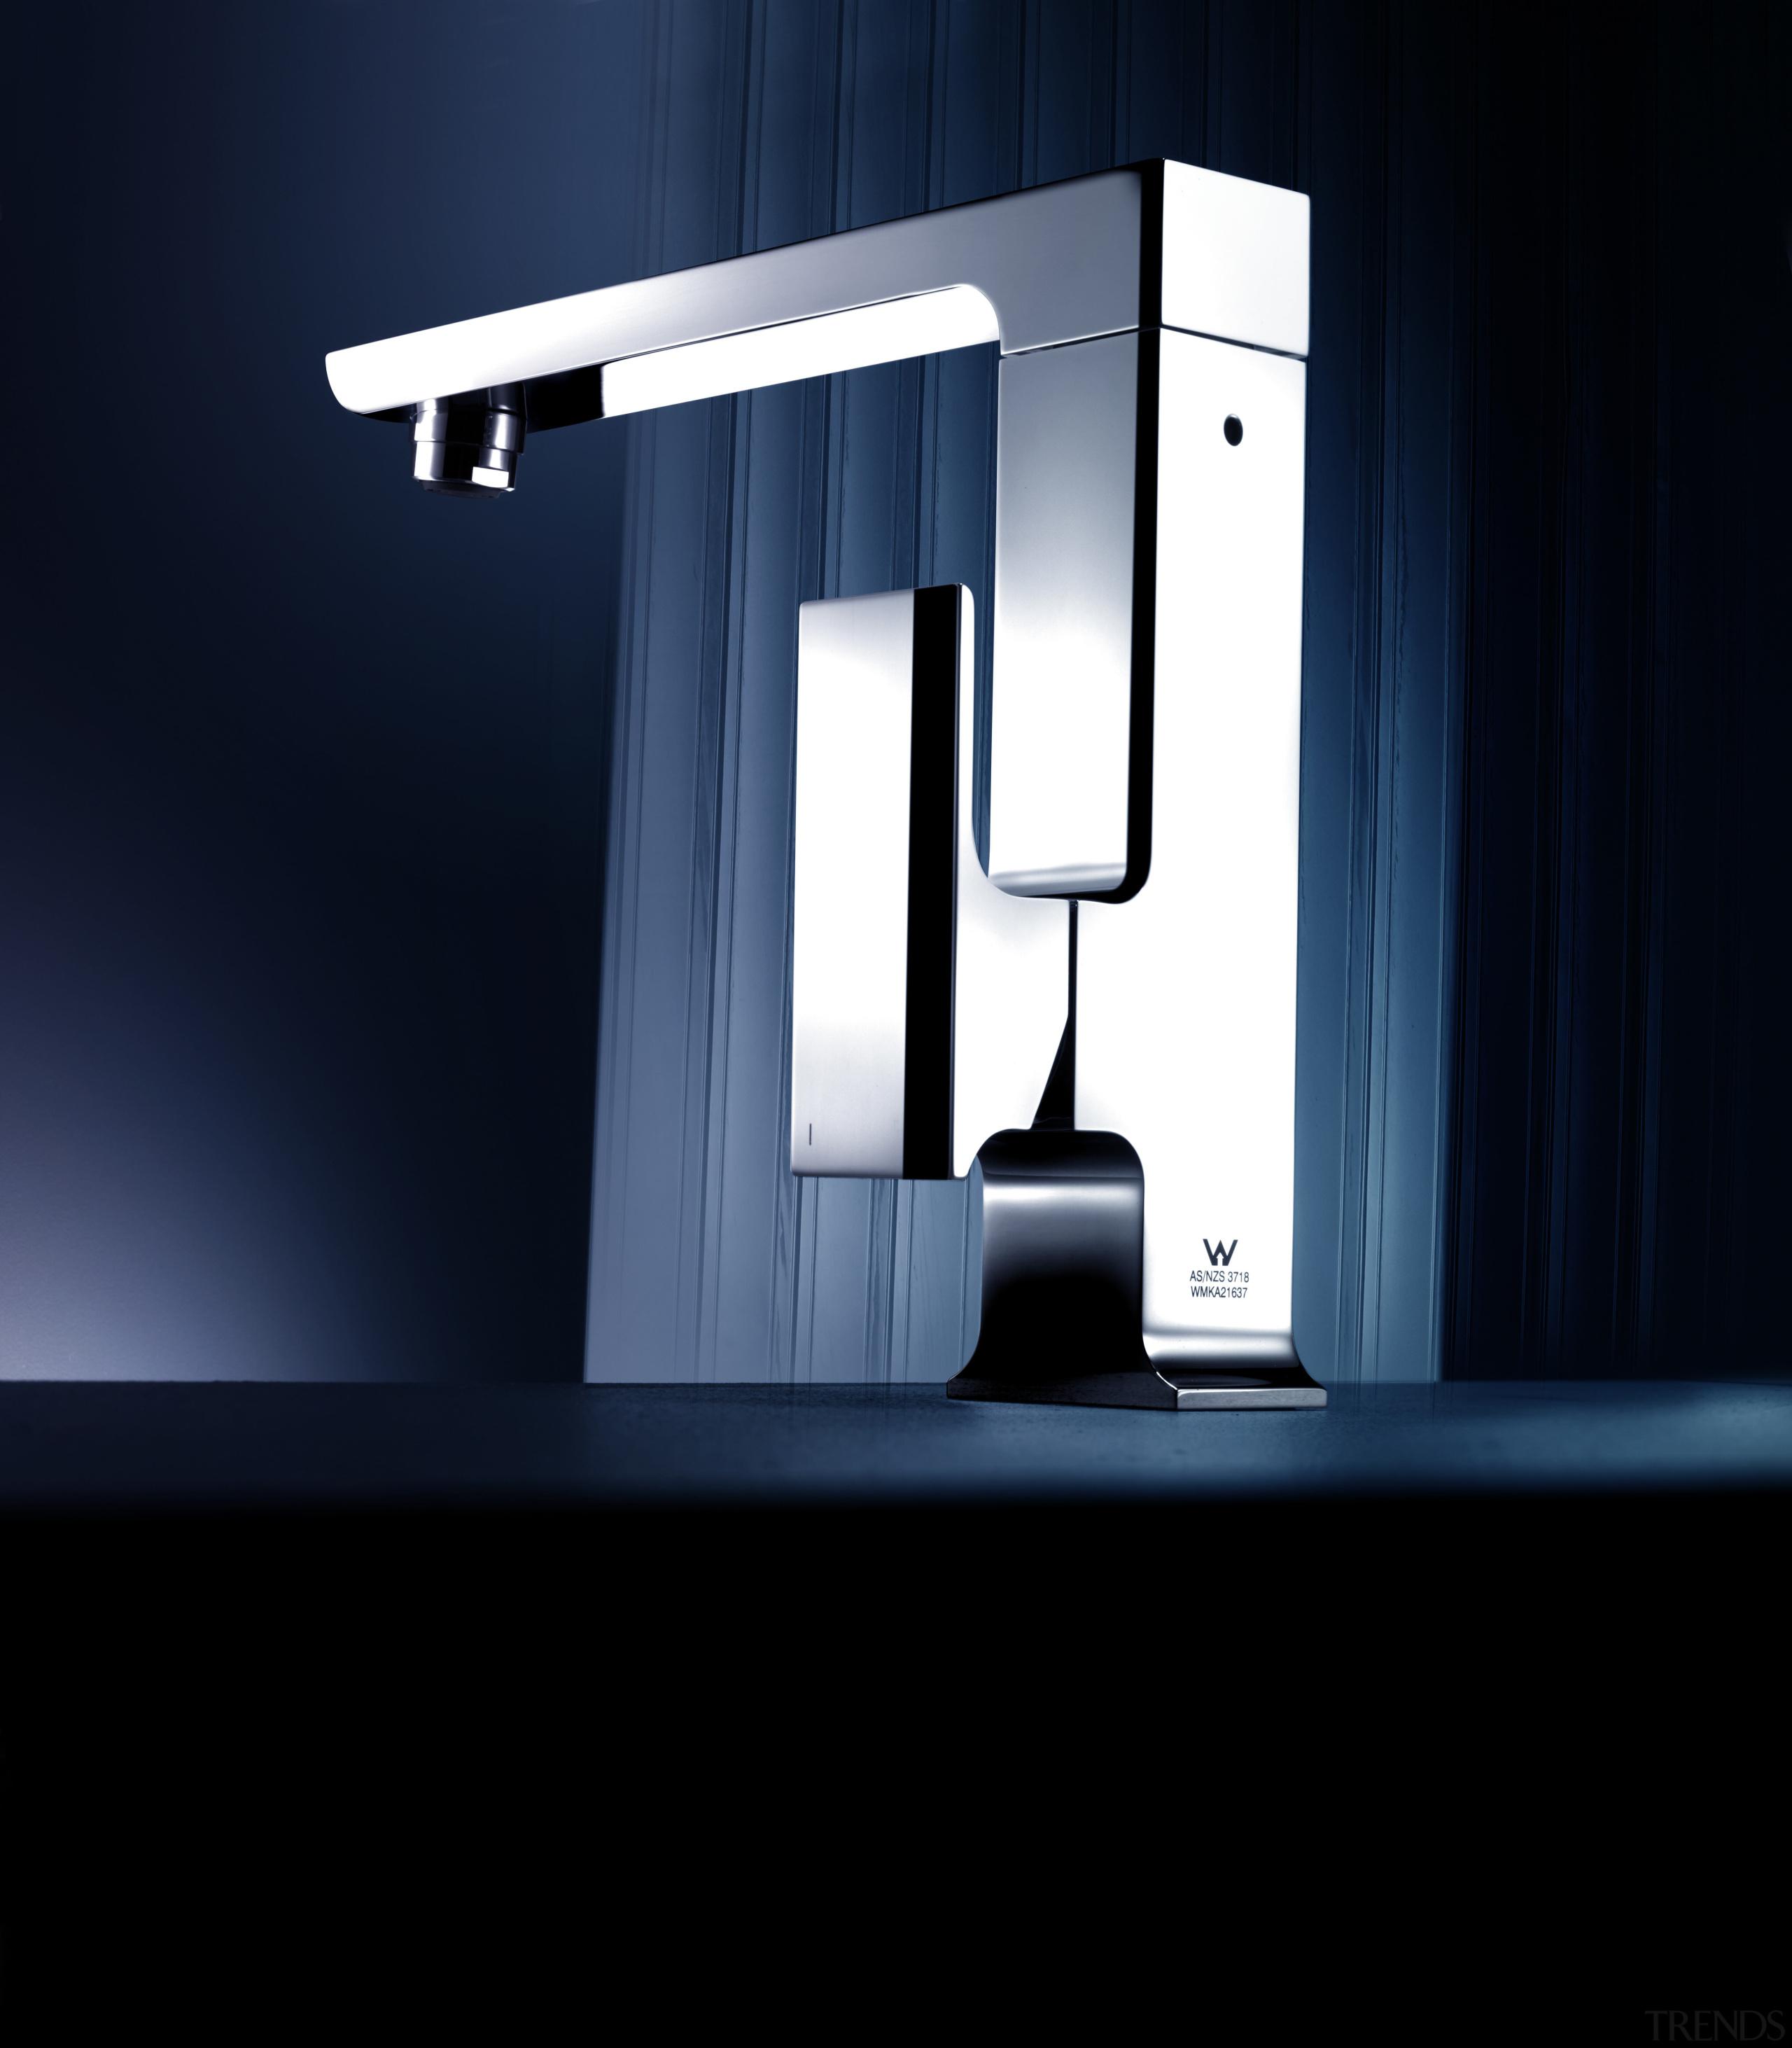 Dorf Jovian sink mixer eco-friendly kitchen fixture lighting, product, product design, tap, black